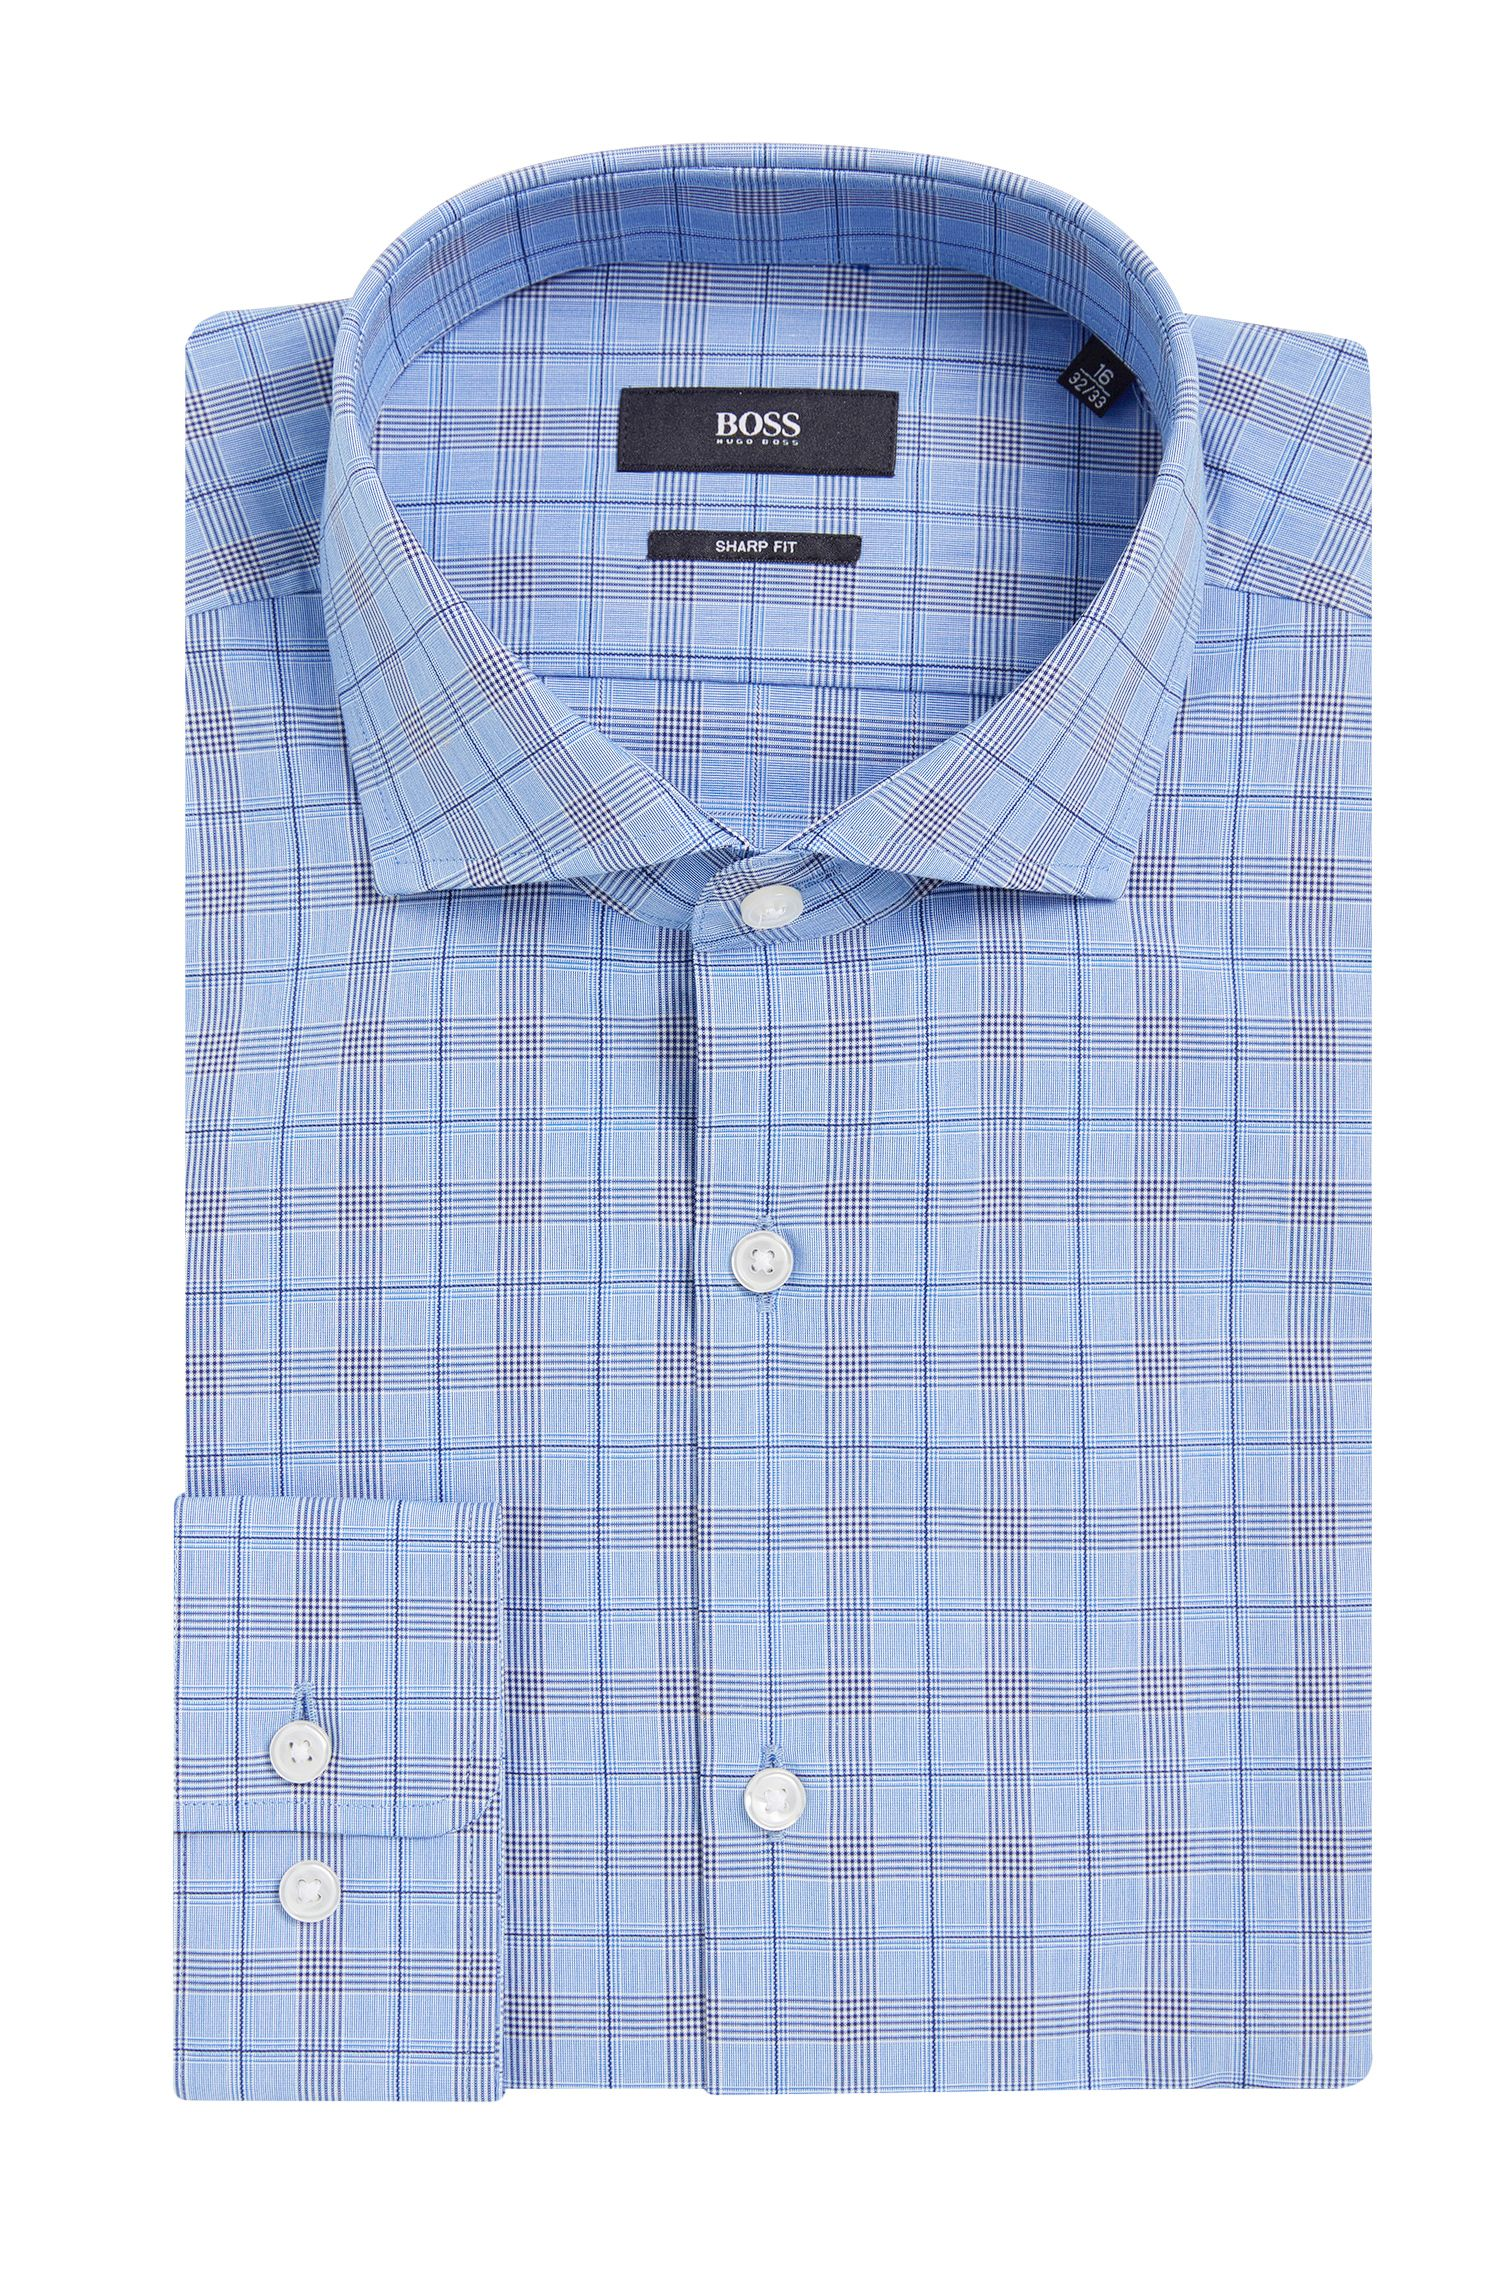 'Mark US'   Sharp Fit, Cotton Patterned Dress Shirt